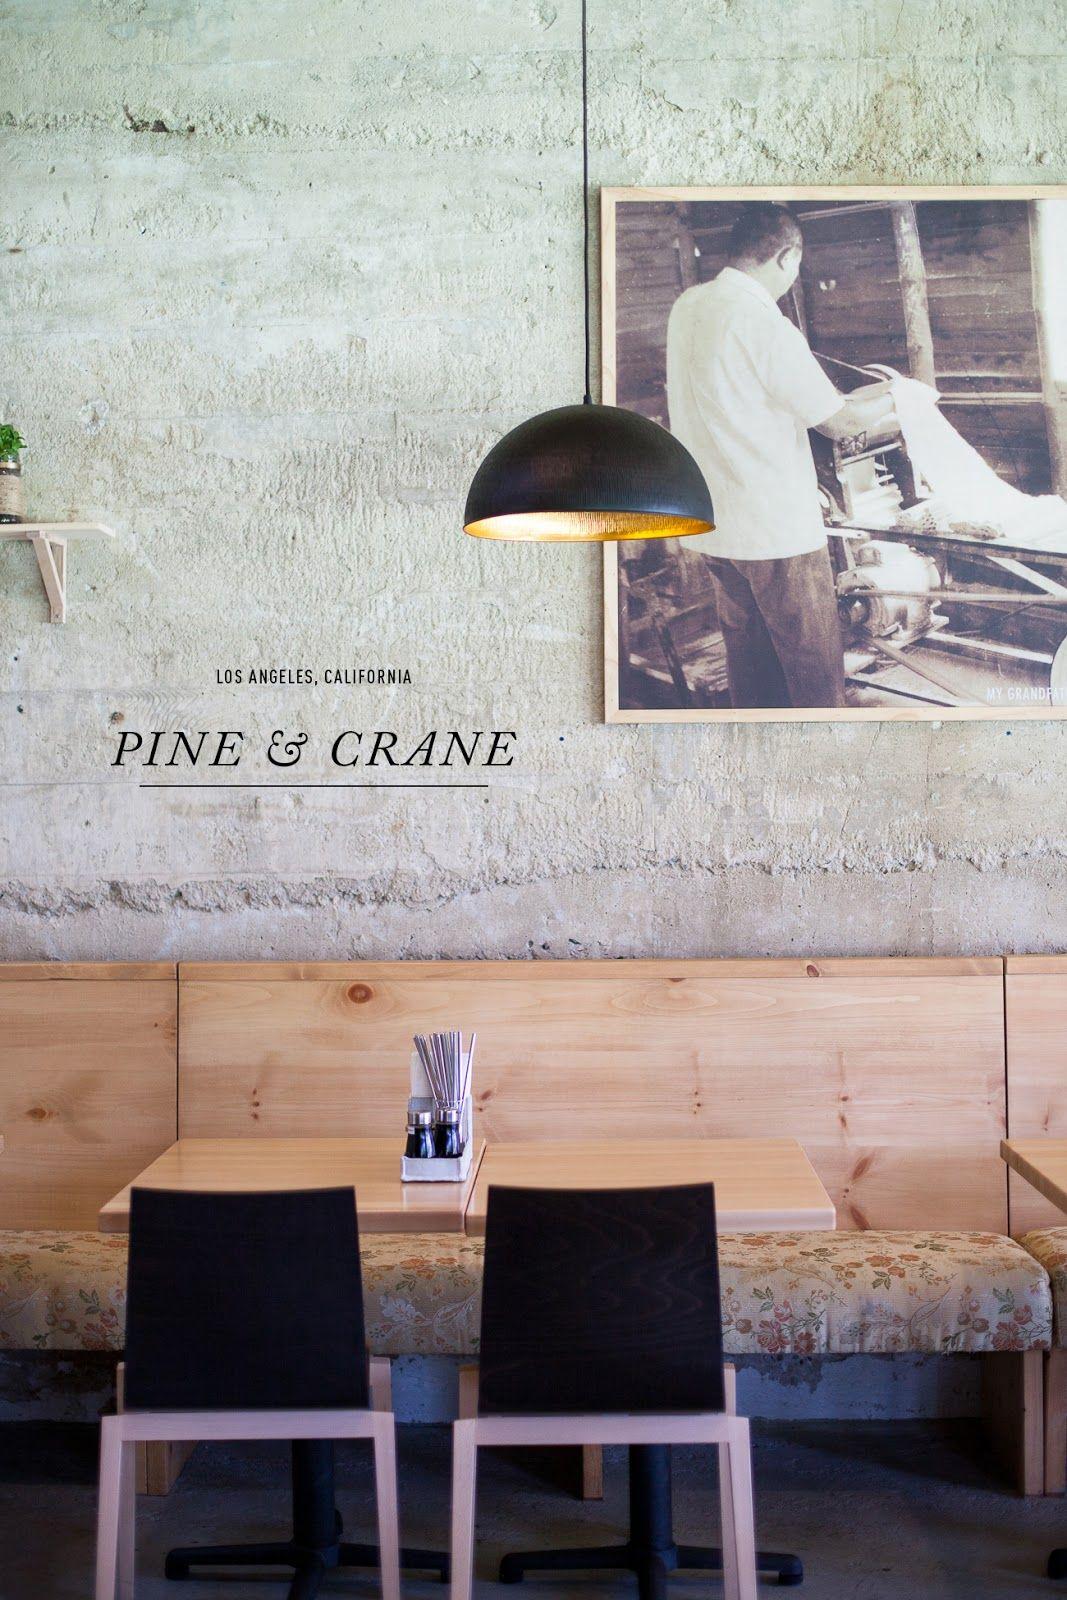 Pine and Crane | Los Angeles, California